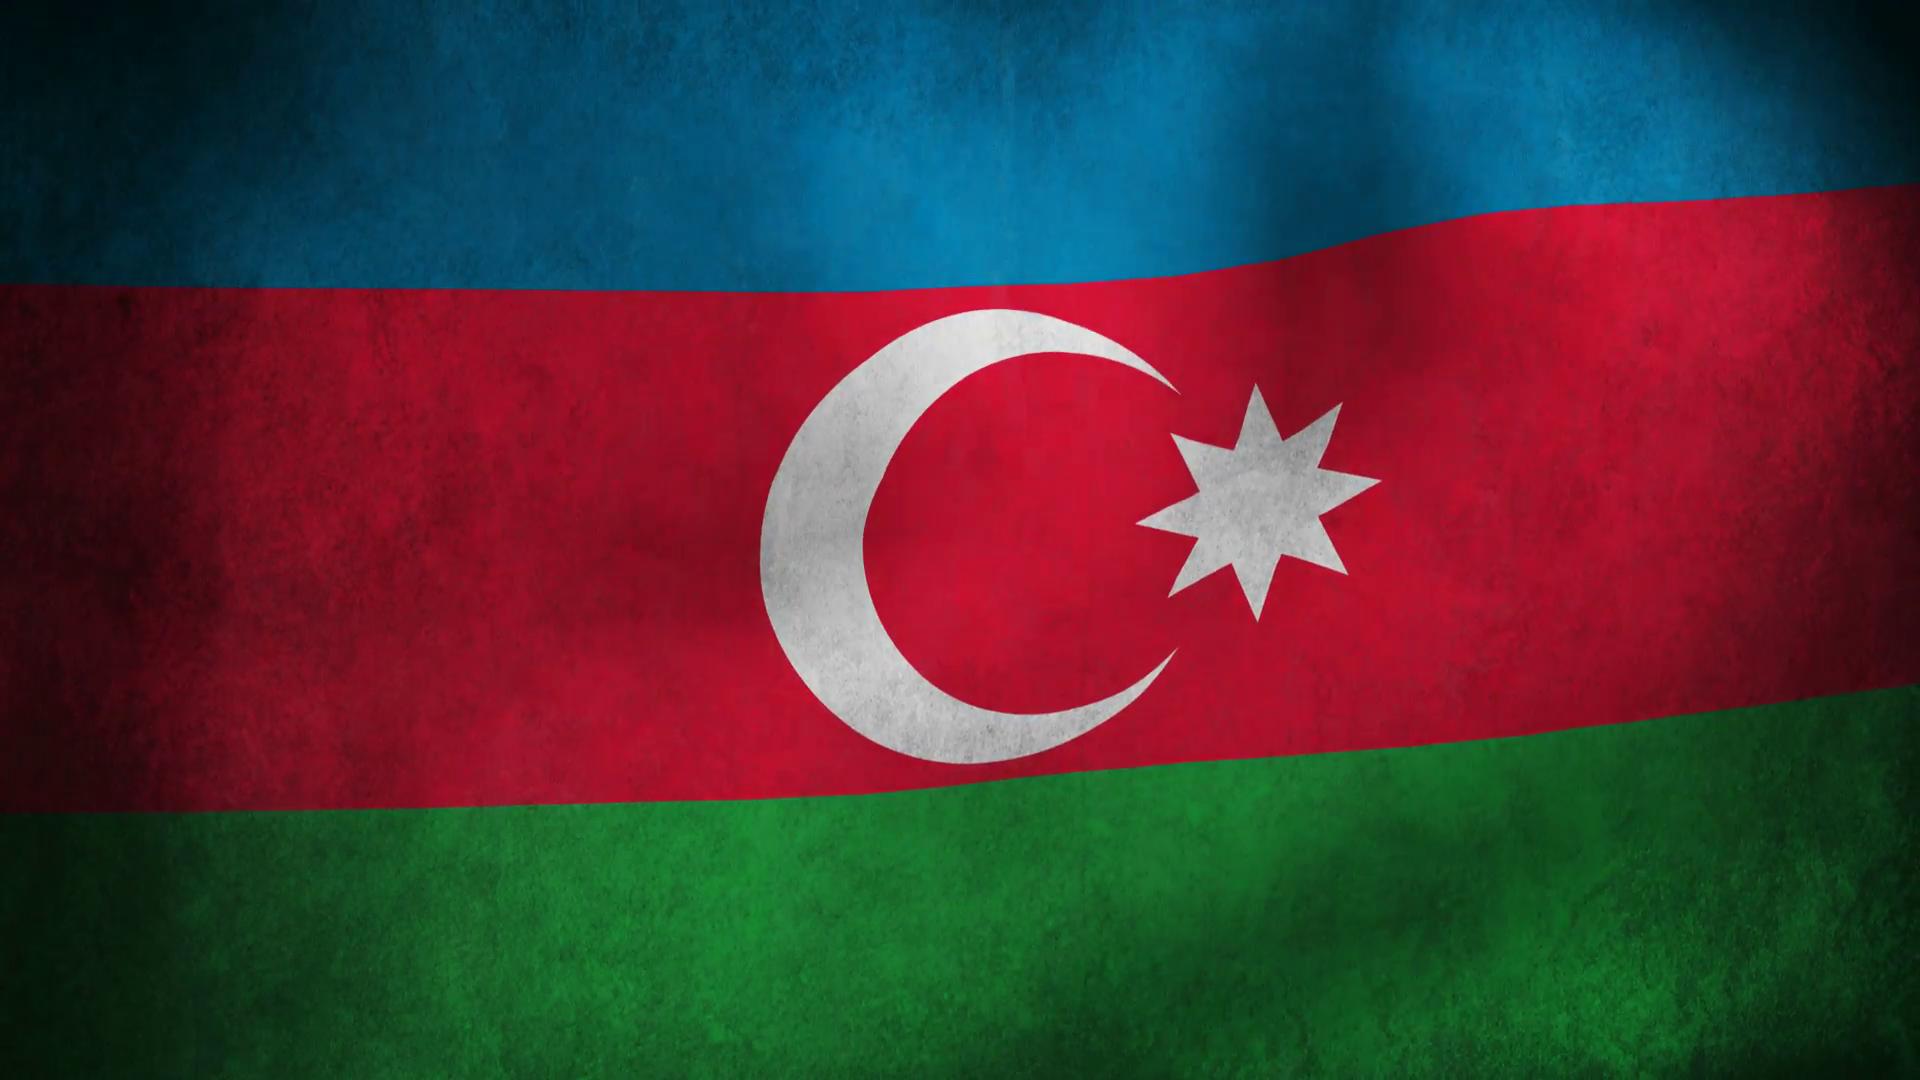 Animation Of Azerbaijan Country Flag Motion Background 1920x1080